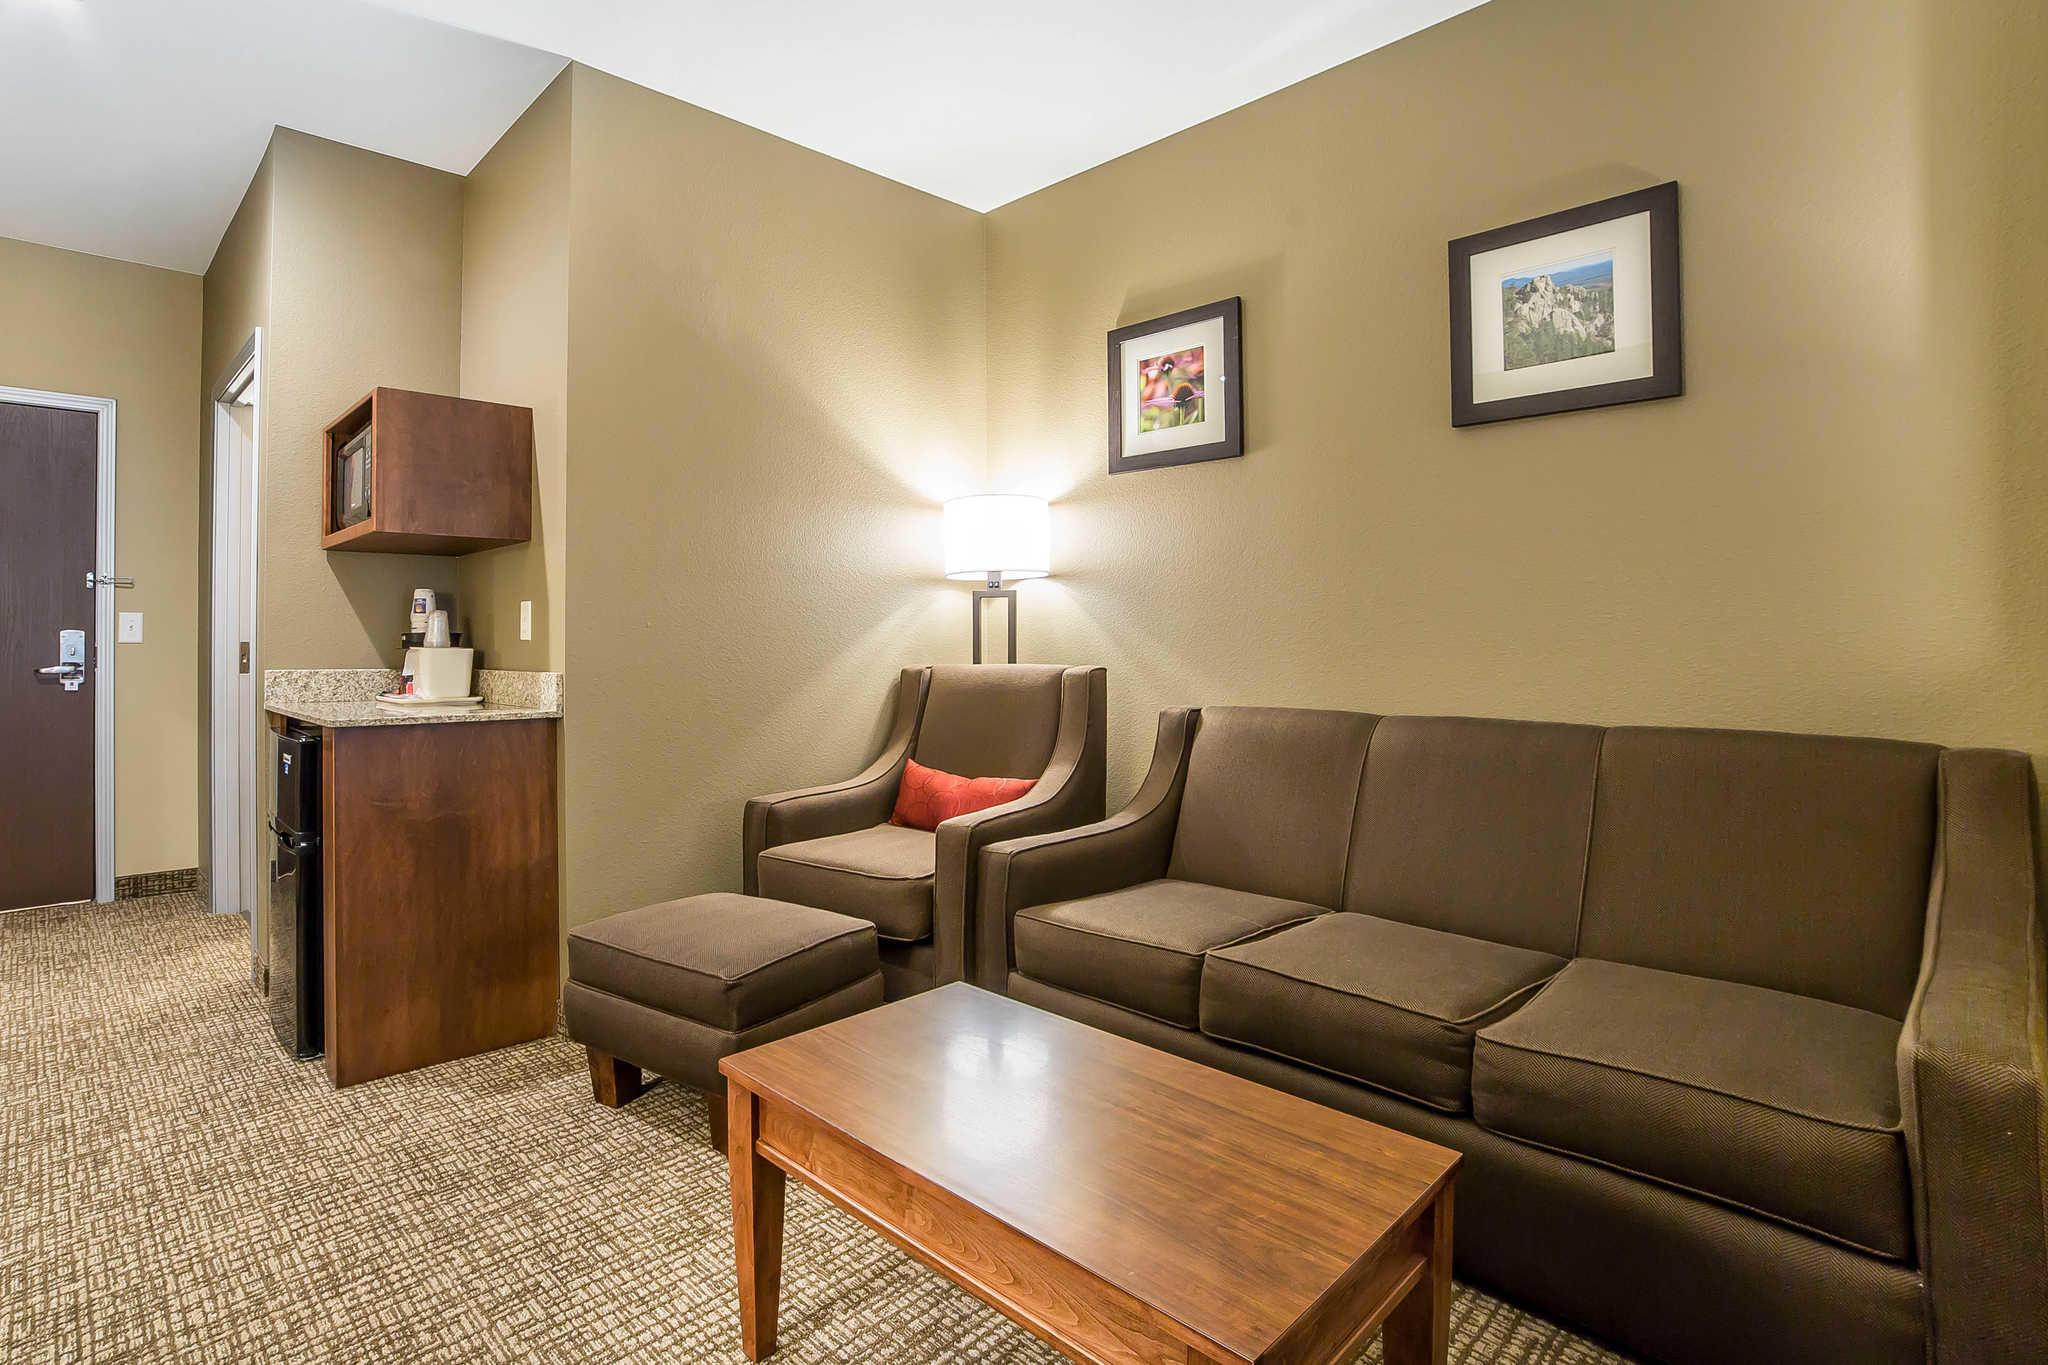 Comfort Inn & Suites Near Mt. Rushmore image 20